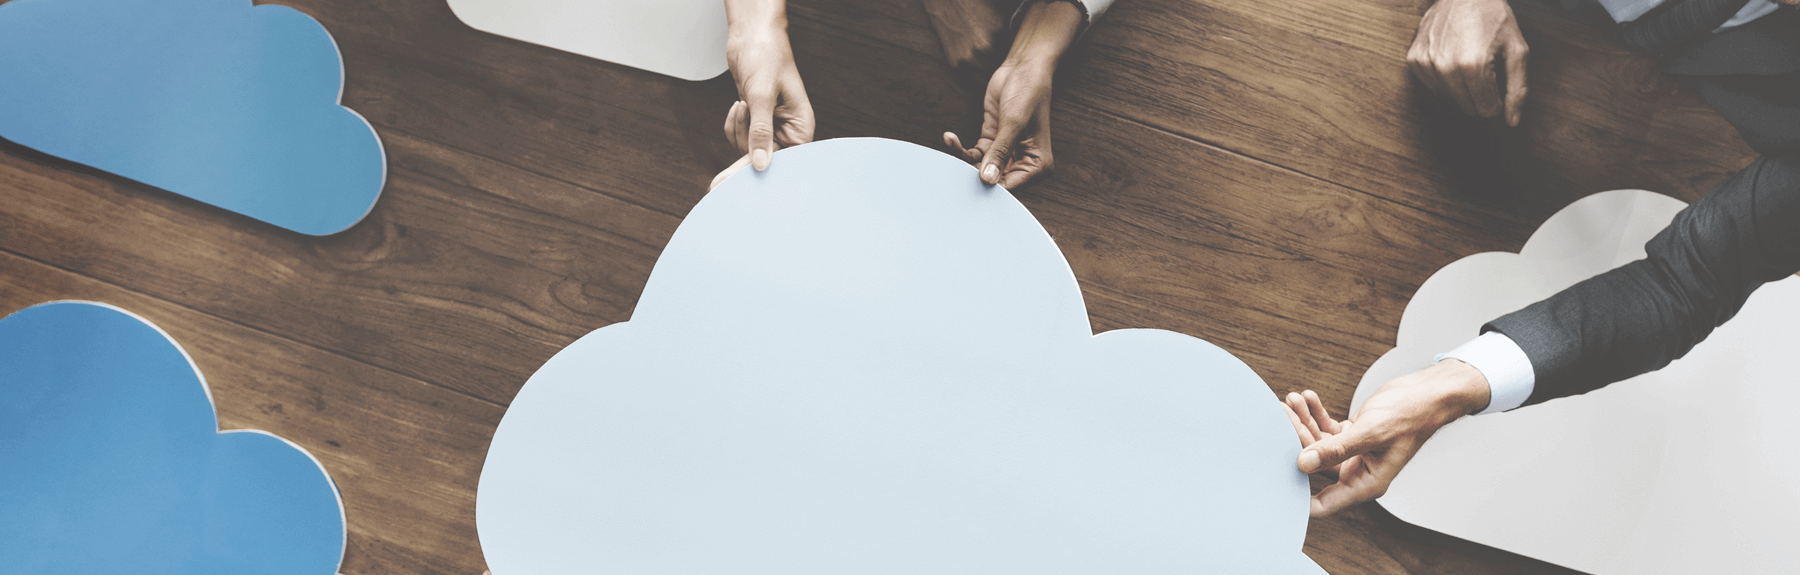 cloud-computing-ux-header